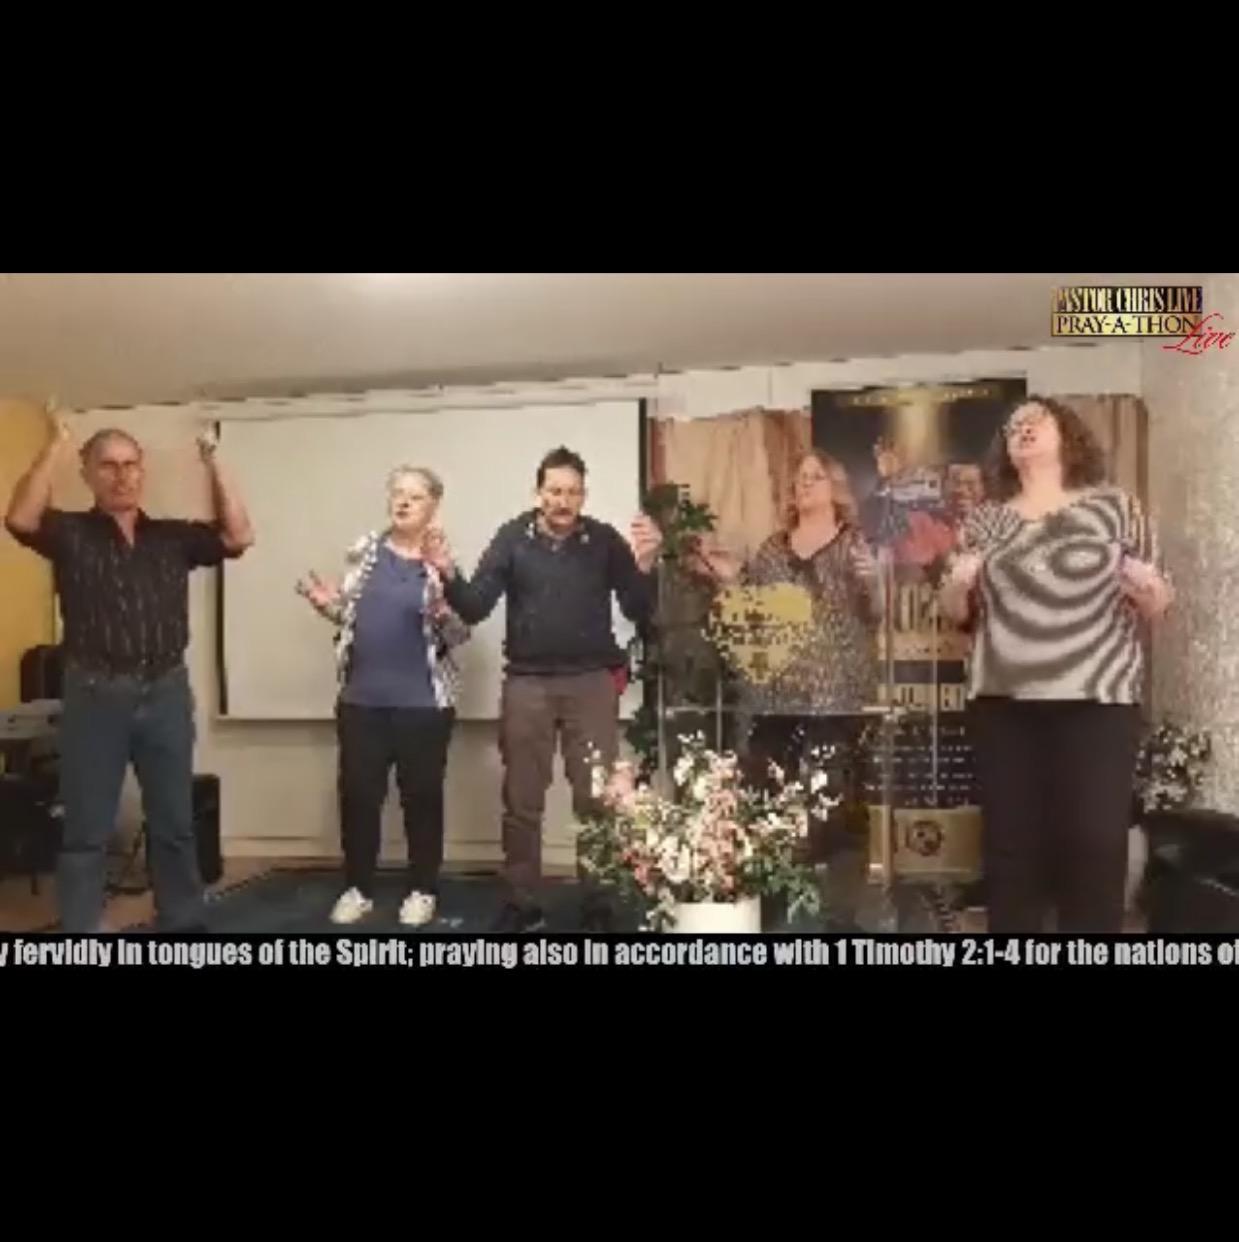 WESTERN EUROPE ZONE 3 Prayer-A-Thon